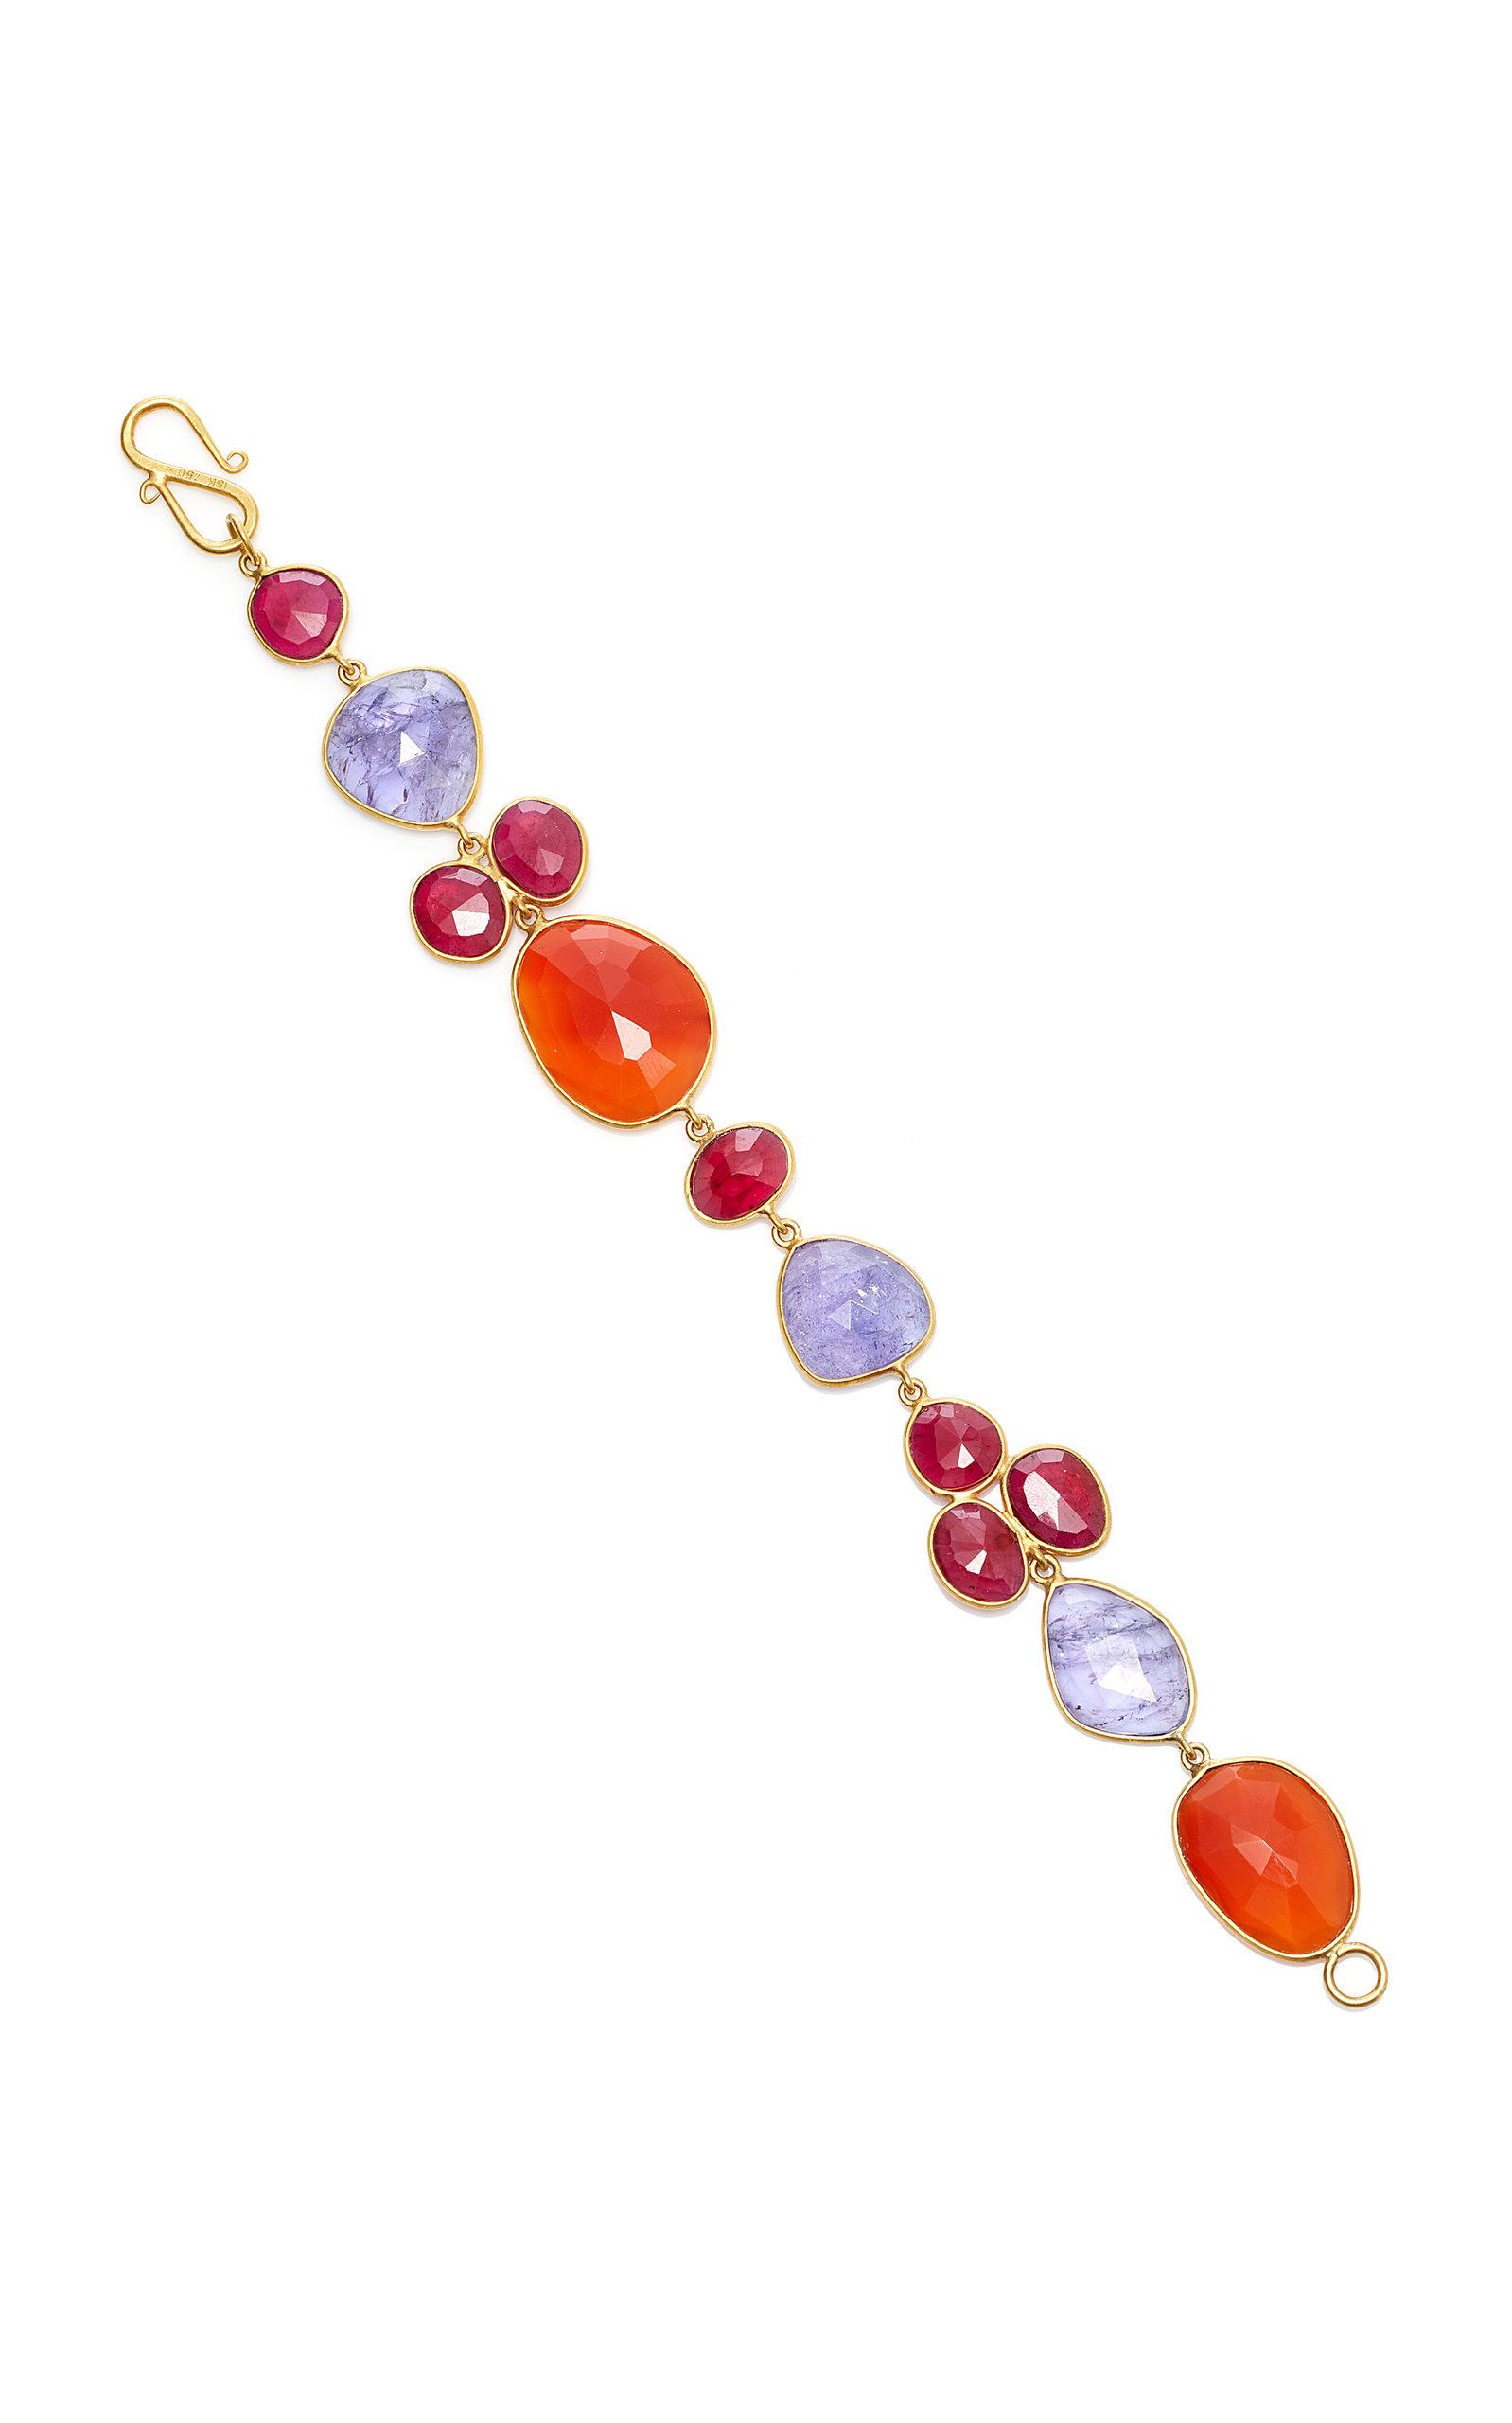 BAHINA 18K Gold Tanzanite Ruby And Carnelian Bracelet in Multi